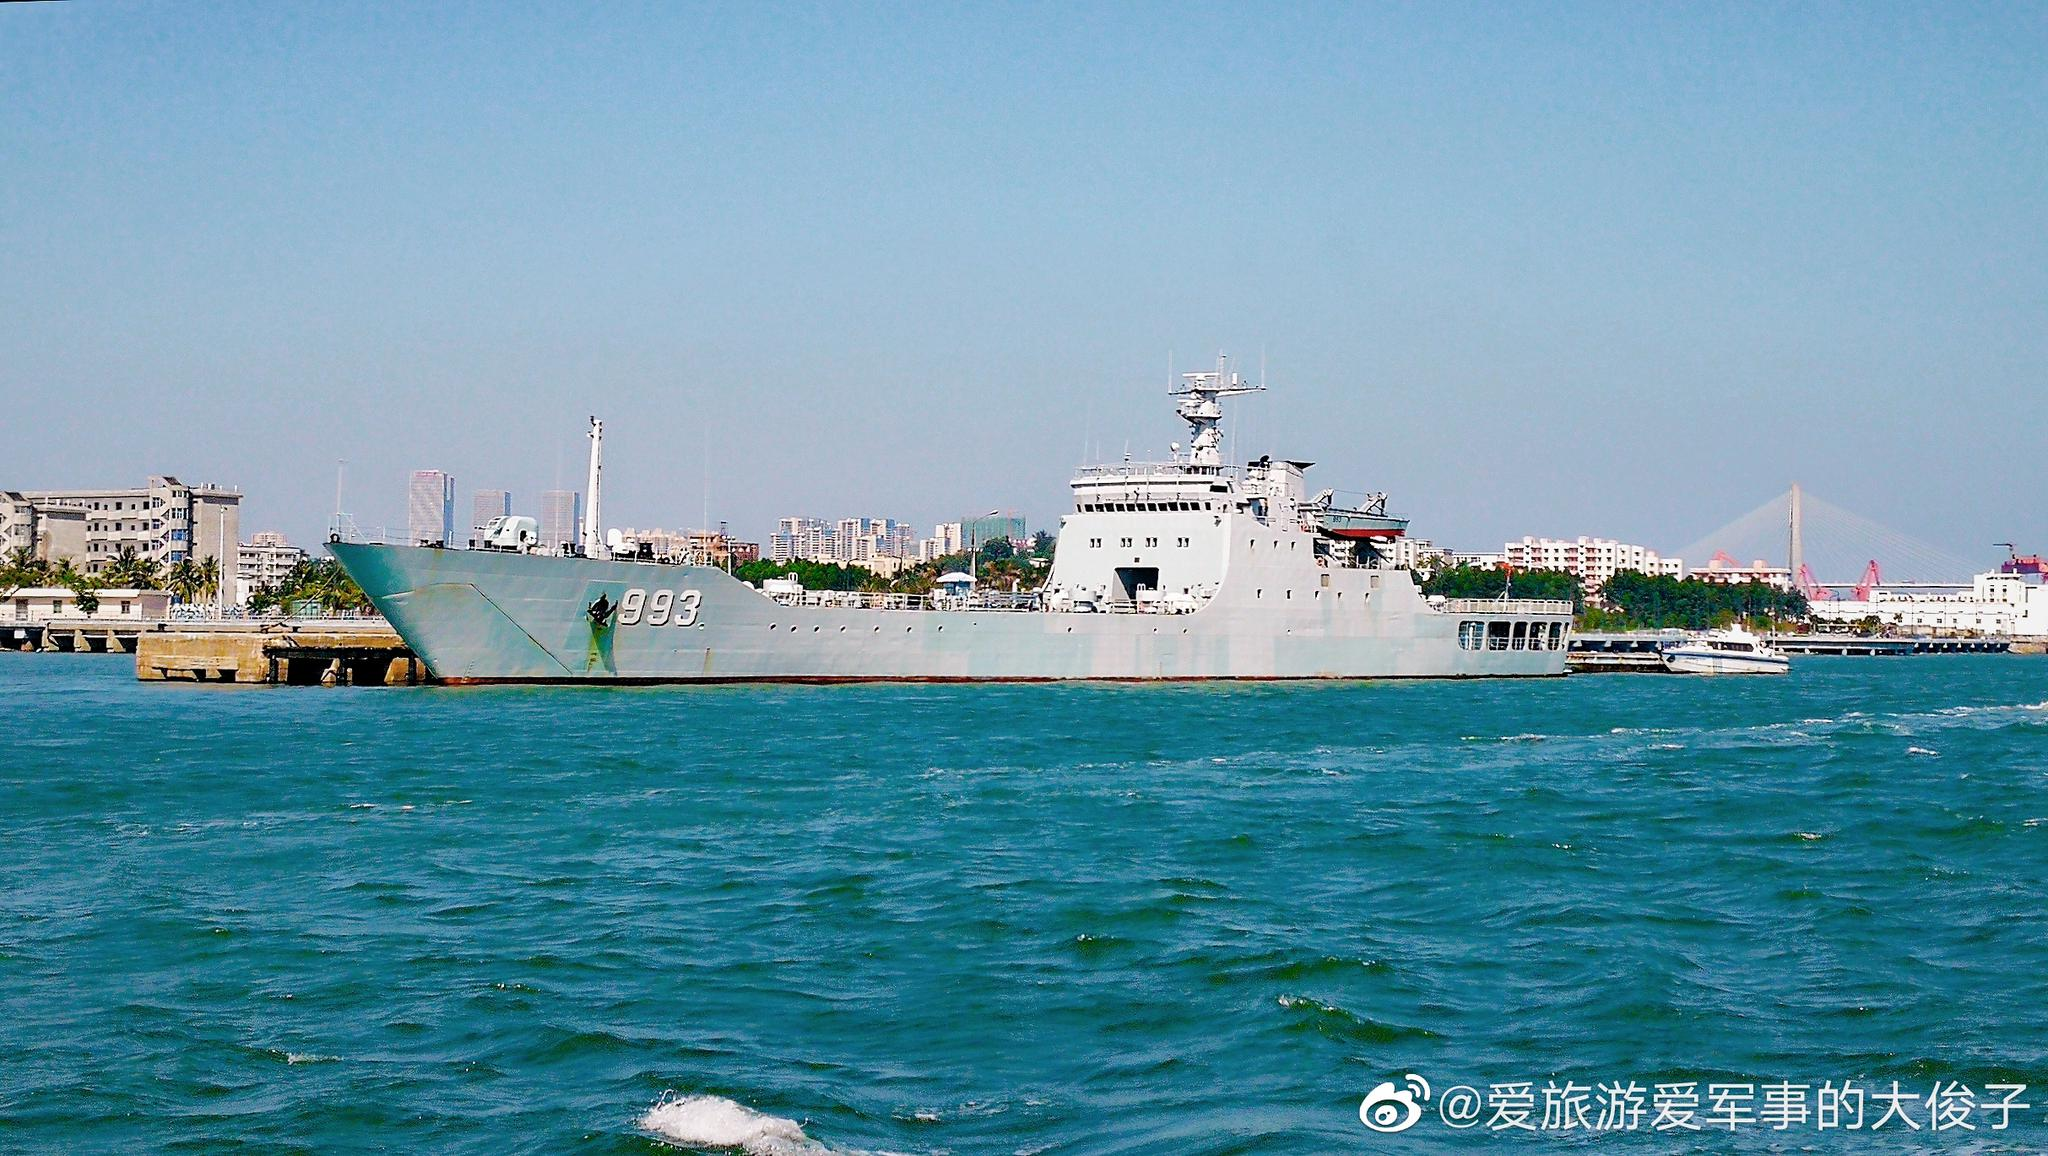 072A型大型坦克登陆舰993罗霄山舰